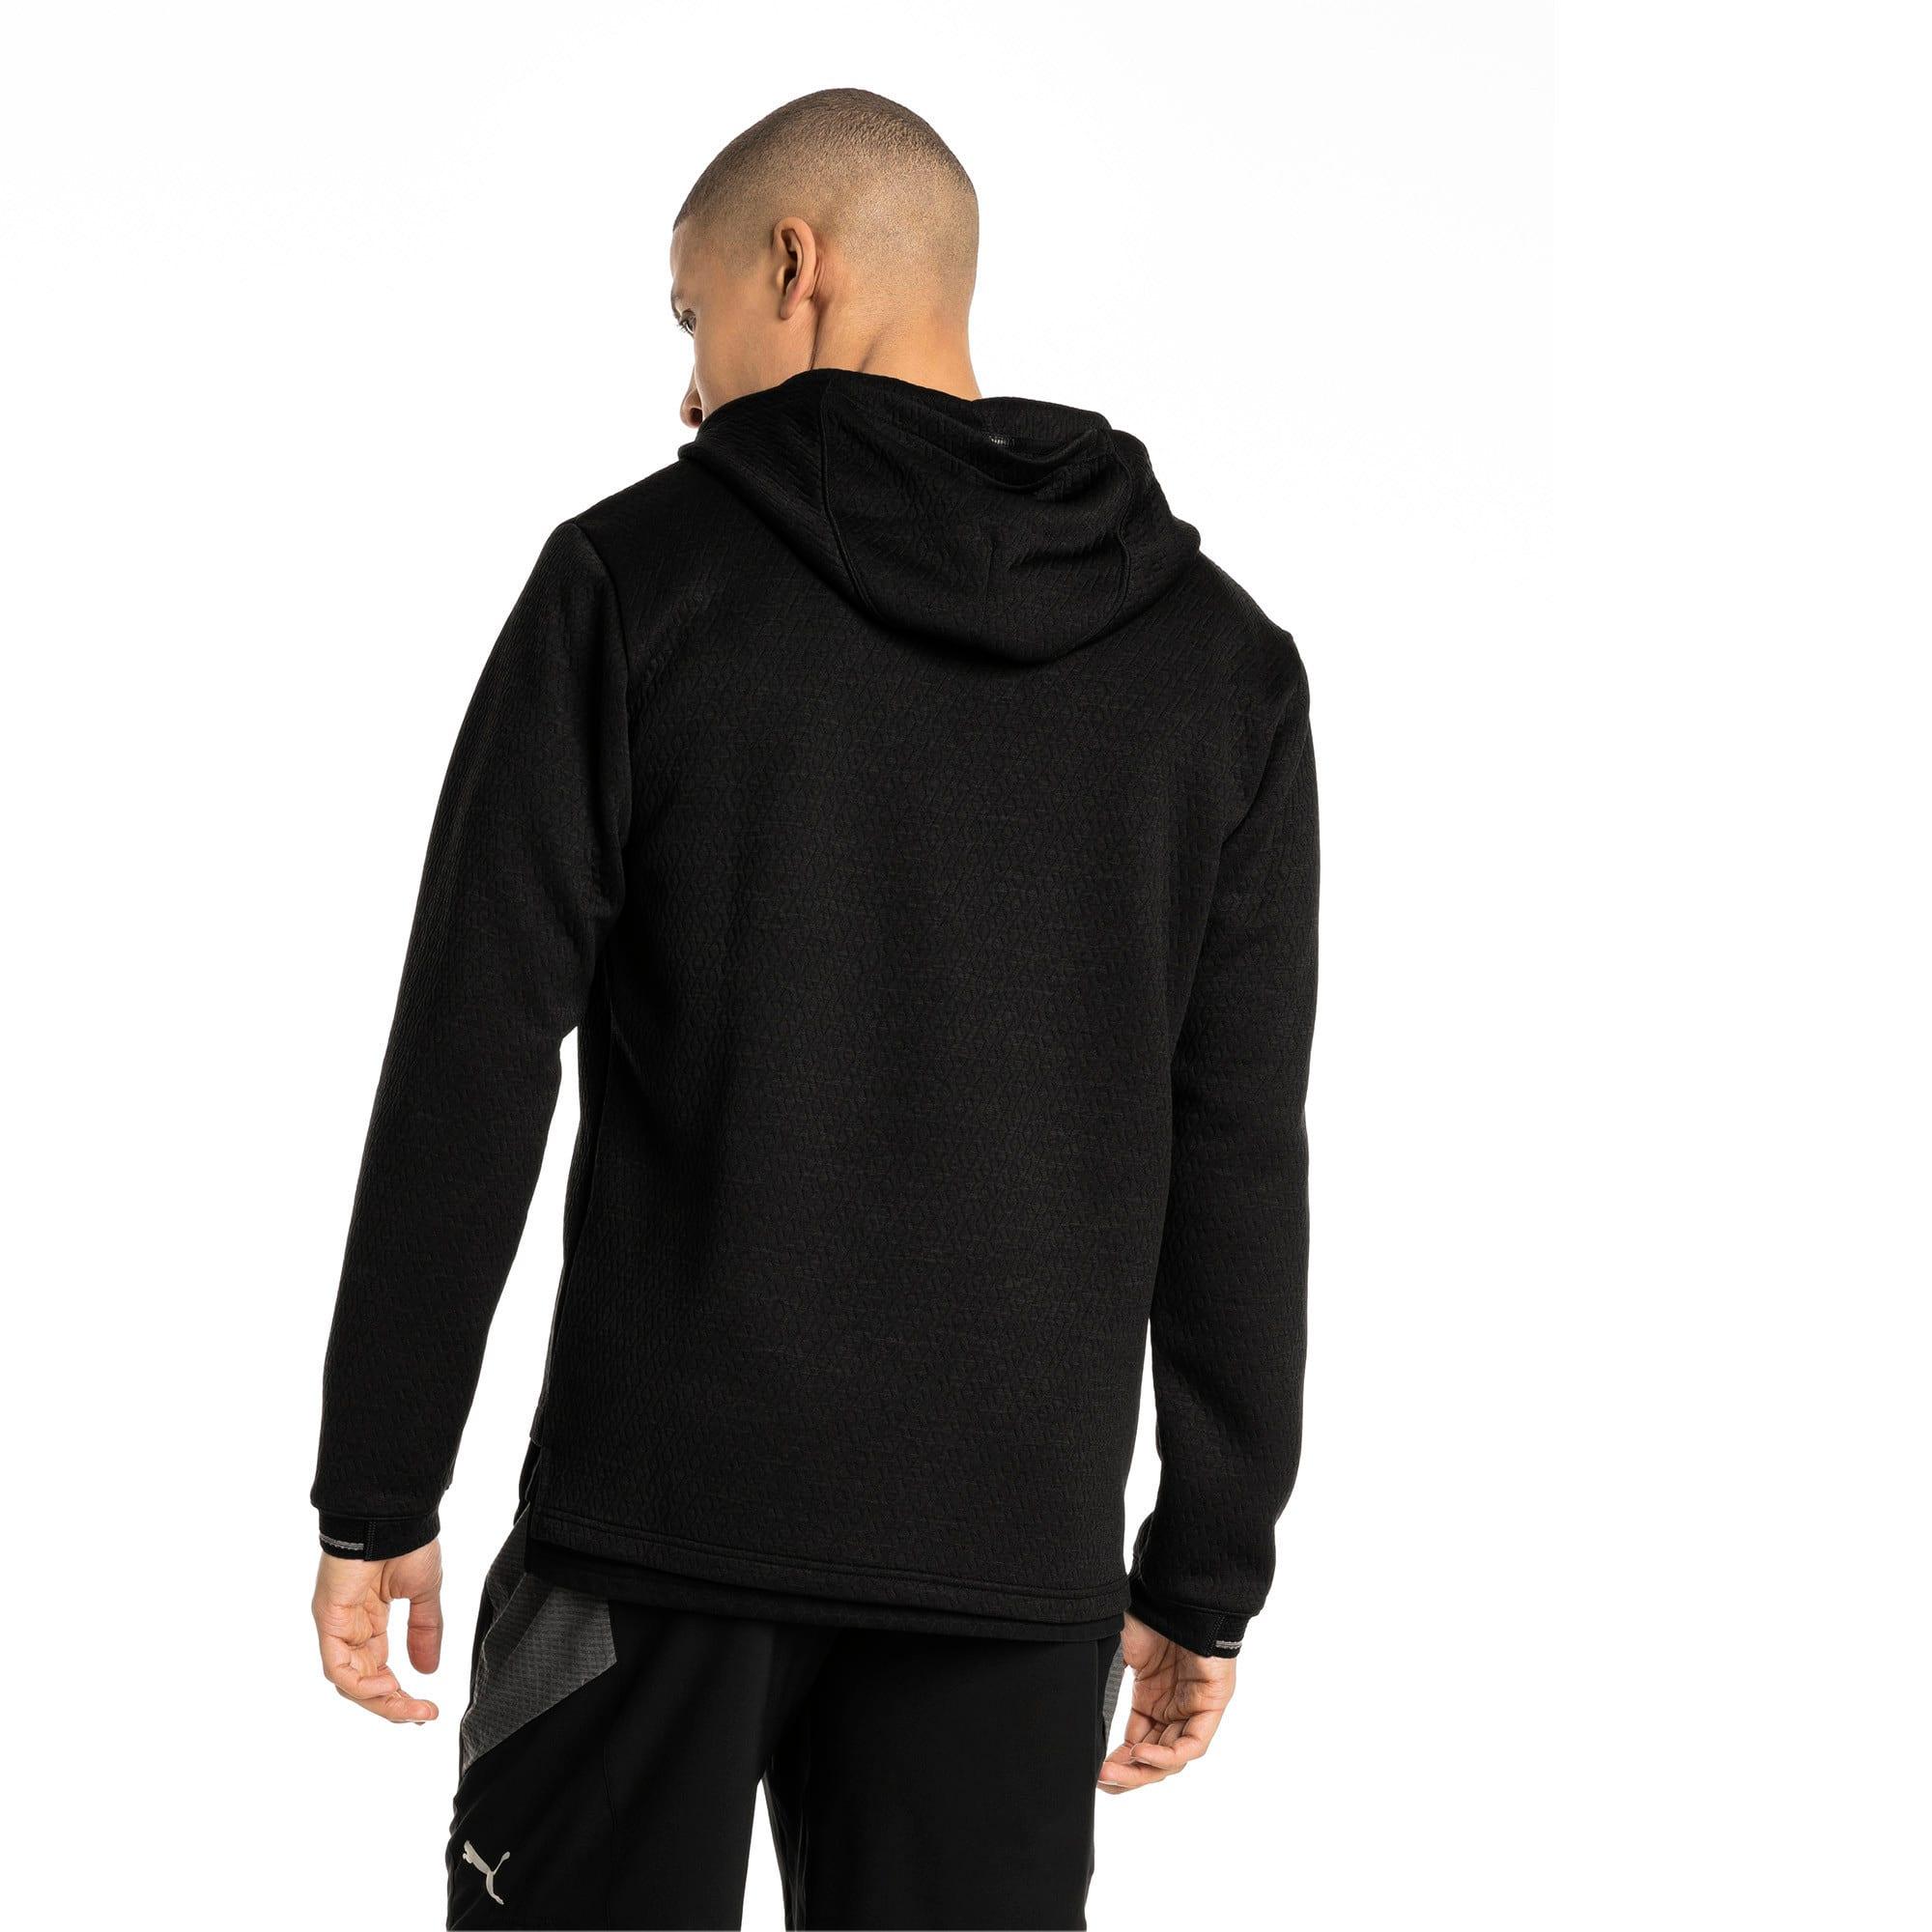 Thumbnail 3 of Energy Zip-Up Hooded Men's Running Jacket, Puma Black Heather, medium